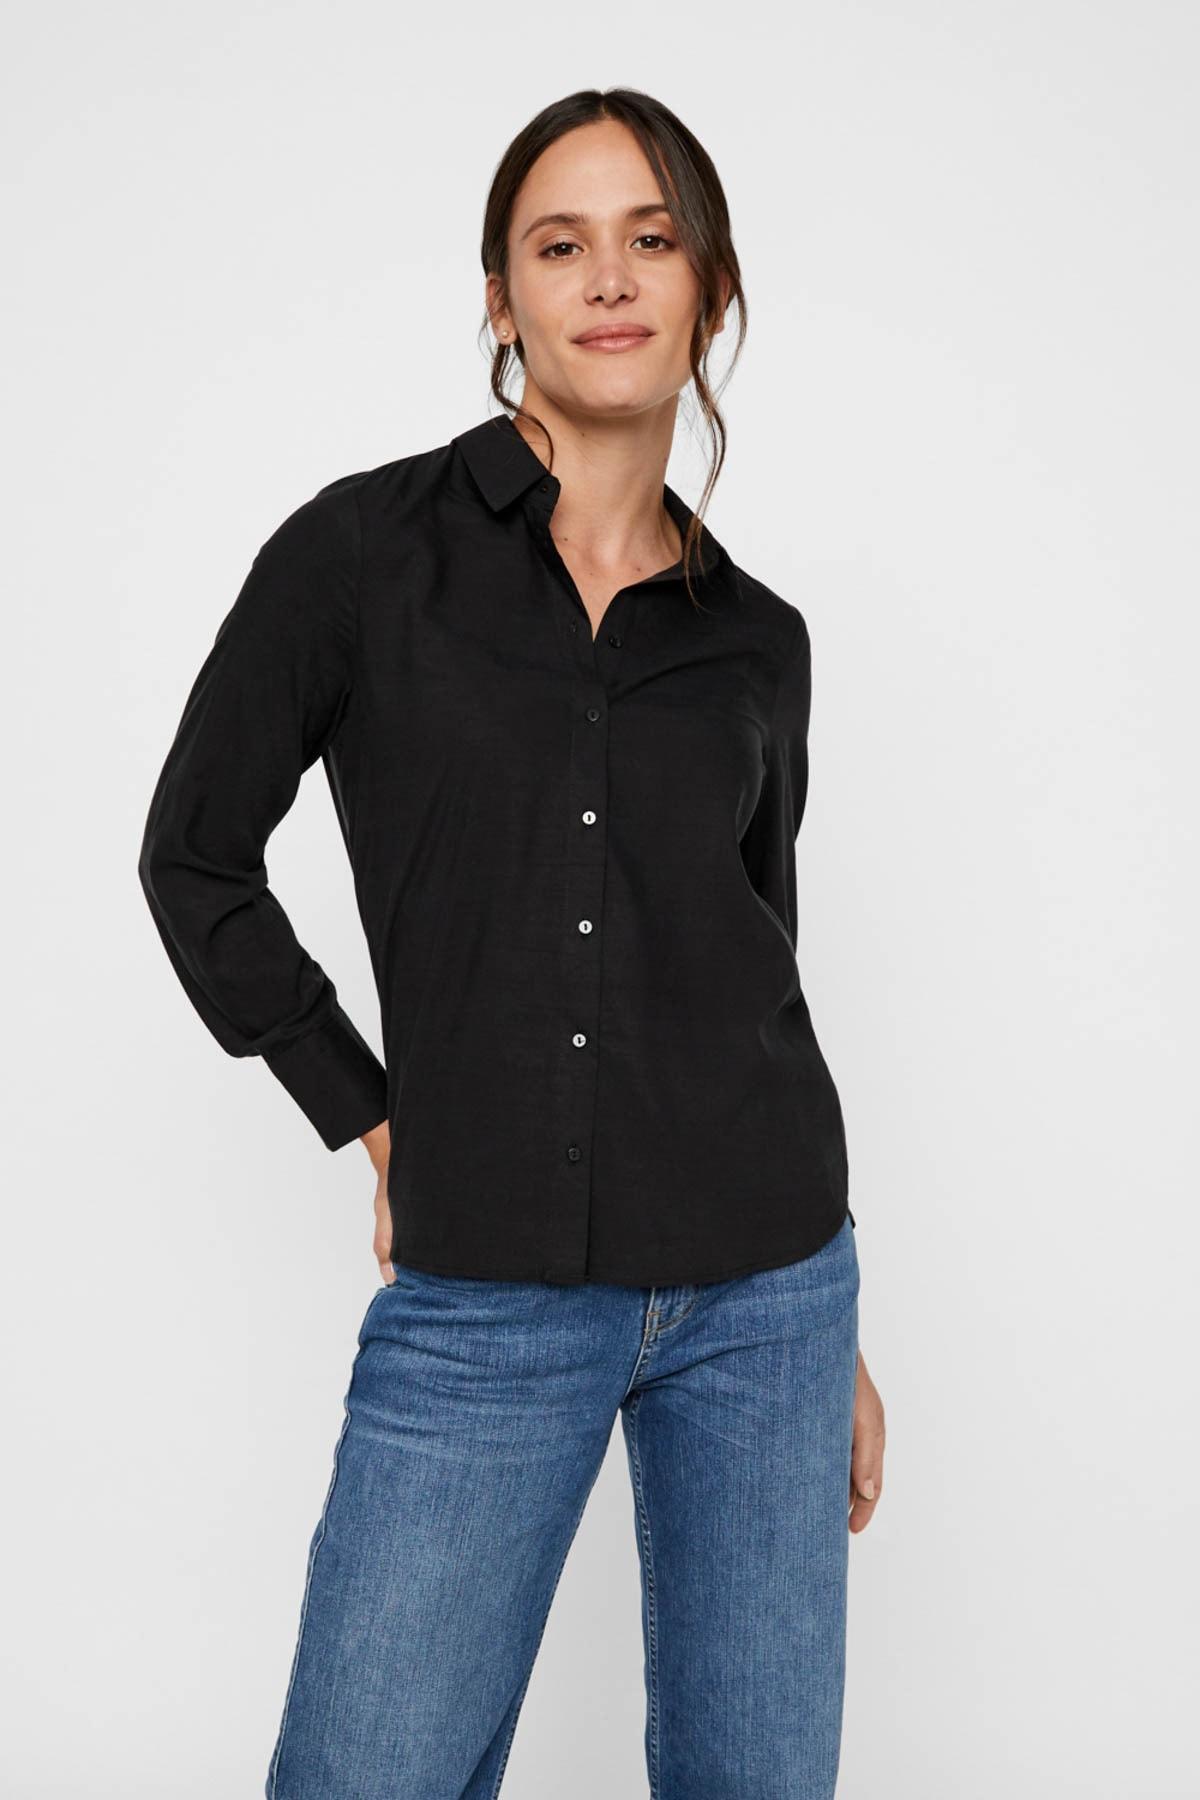 Vero Moda Kadın Siyah Siyah Uzun Kollu Lyocell Gömlek 10218724 VMTANYA 1